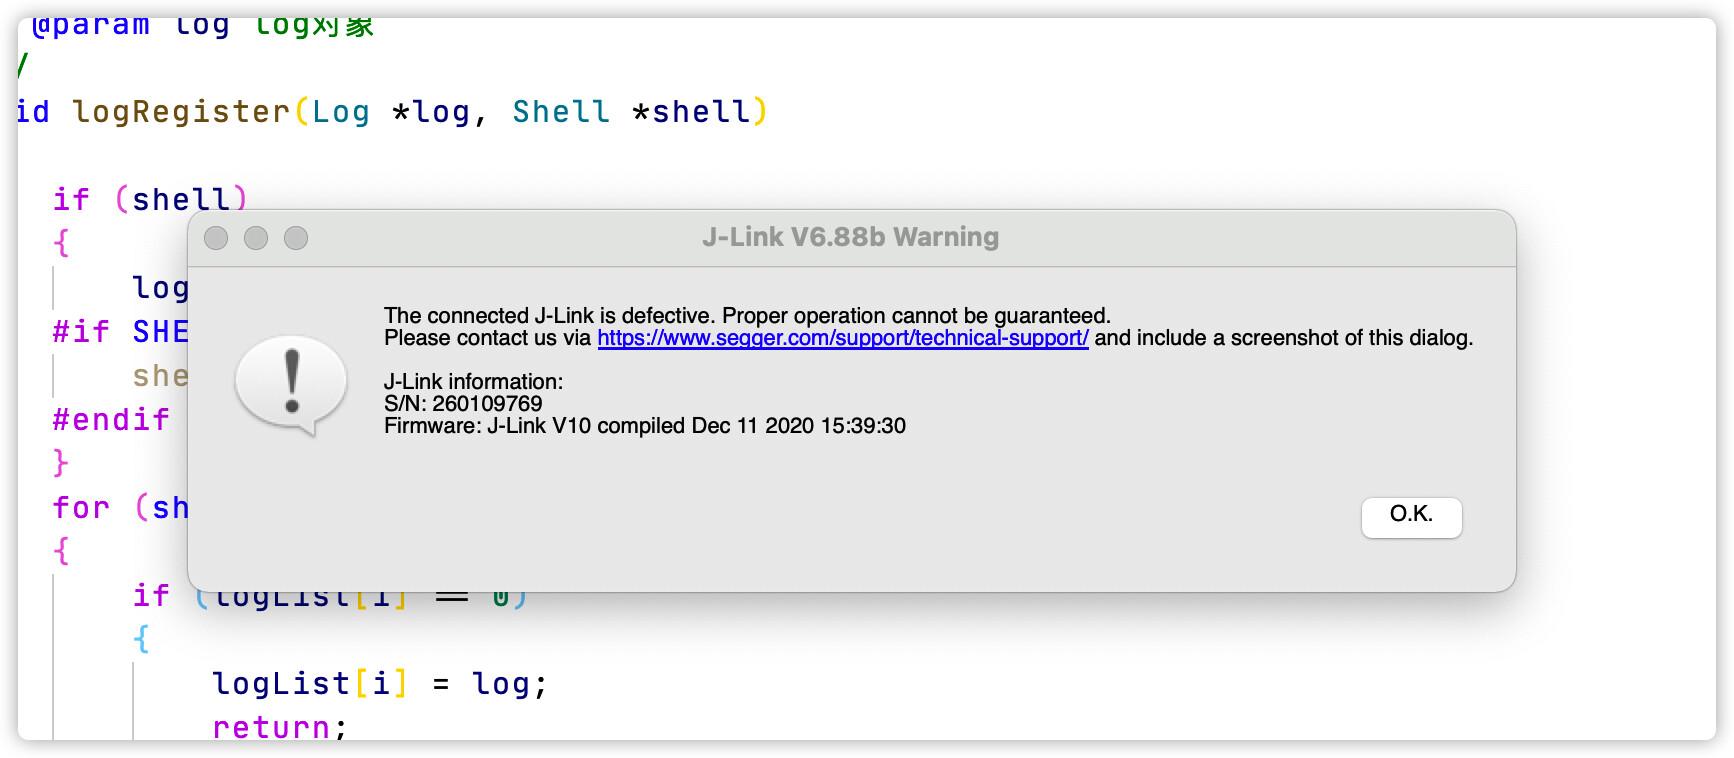 iShot2021-01-11 15.15.02